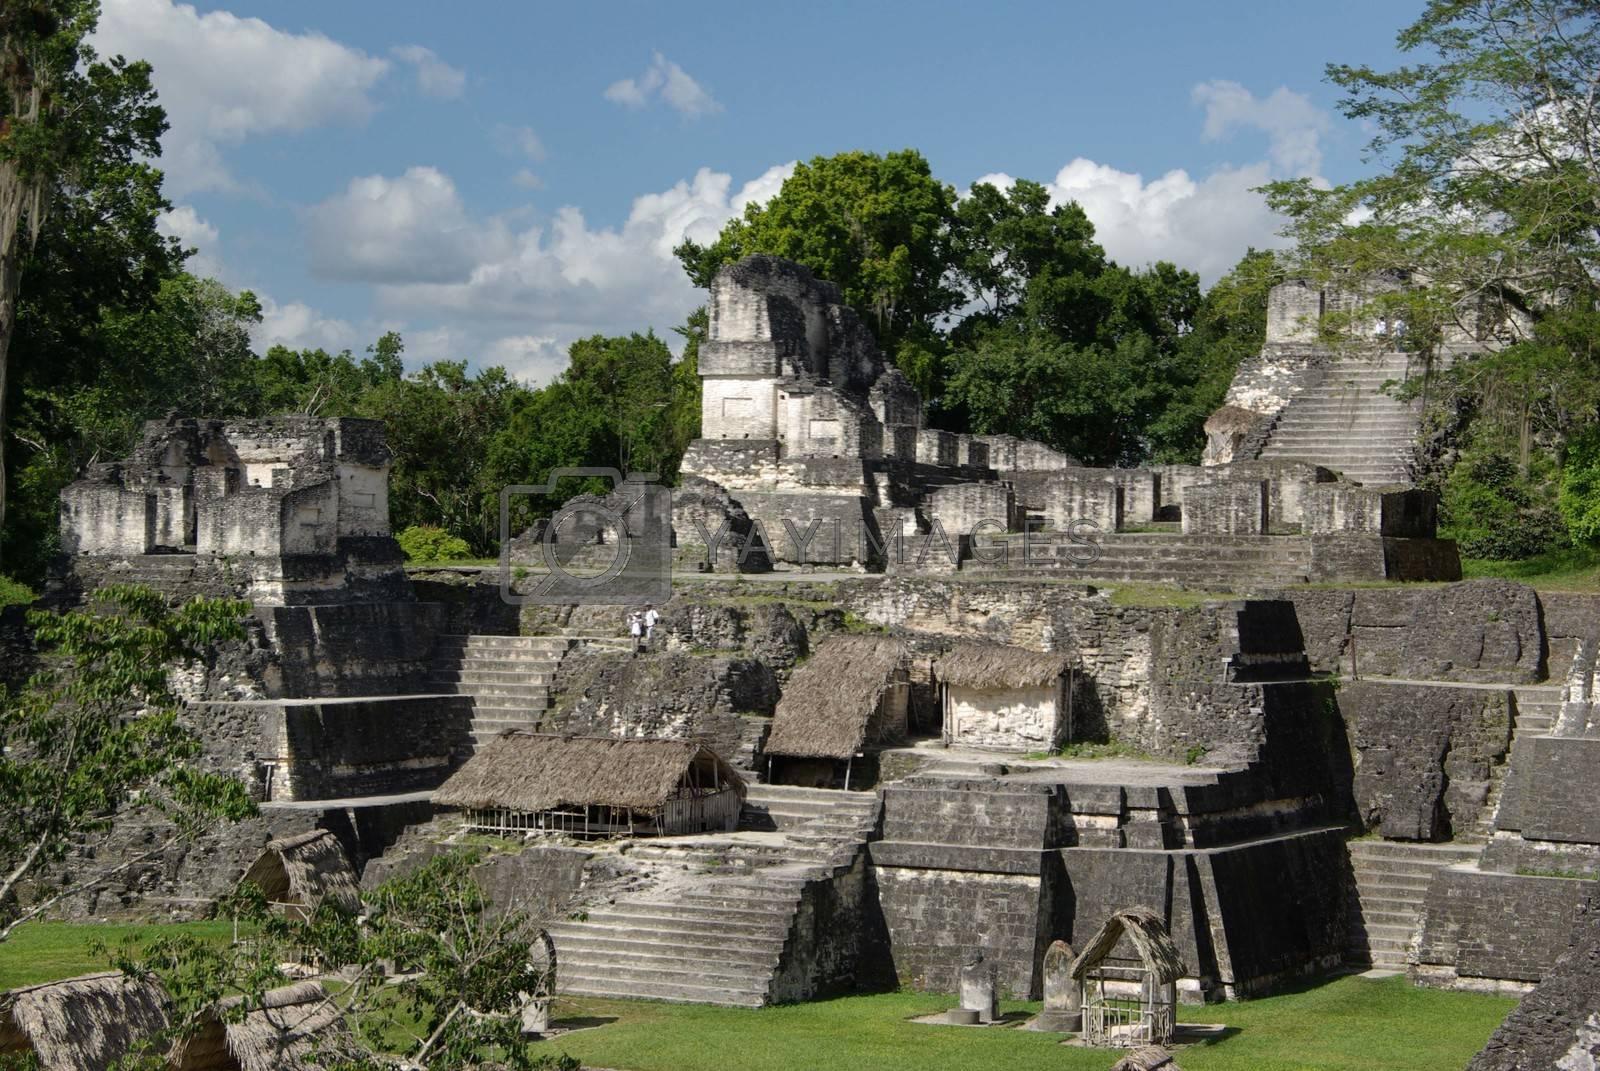 Mayan pyramids in the Mayan ruins of Tikal in Guatemala, Central America